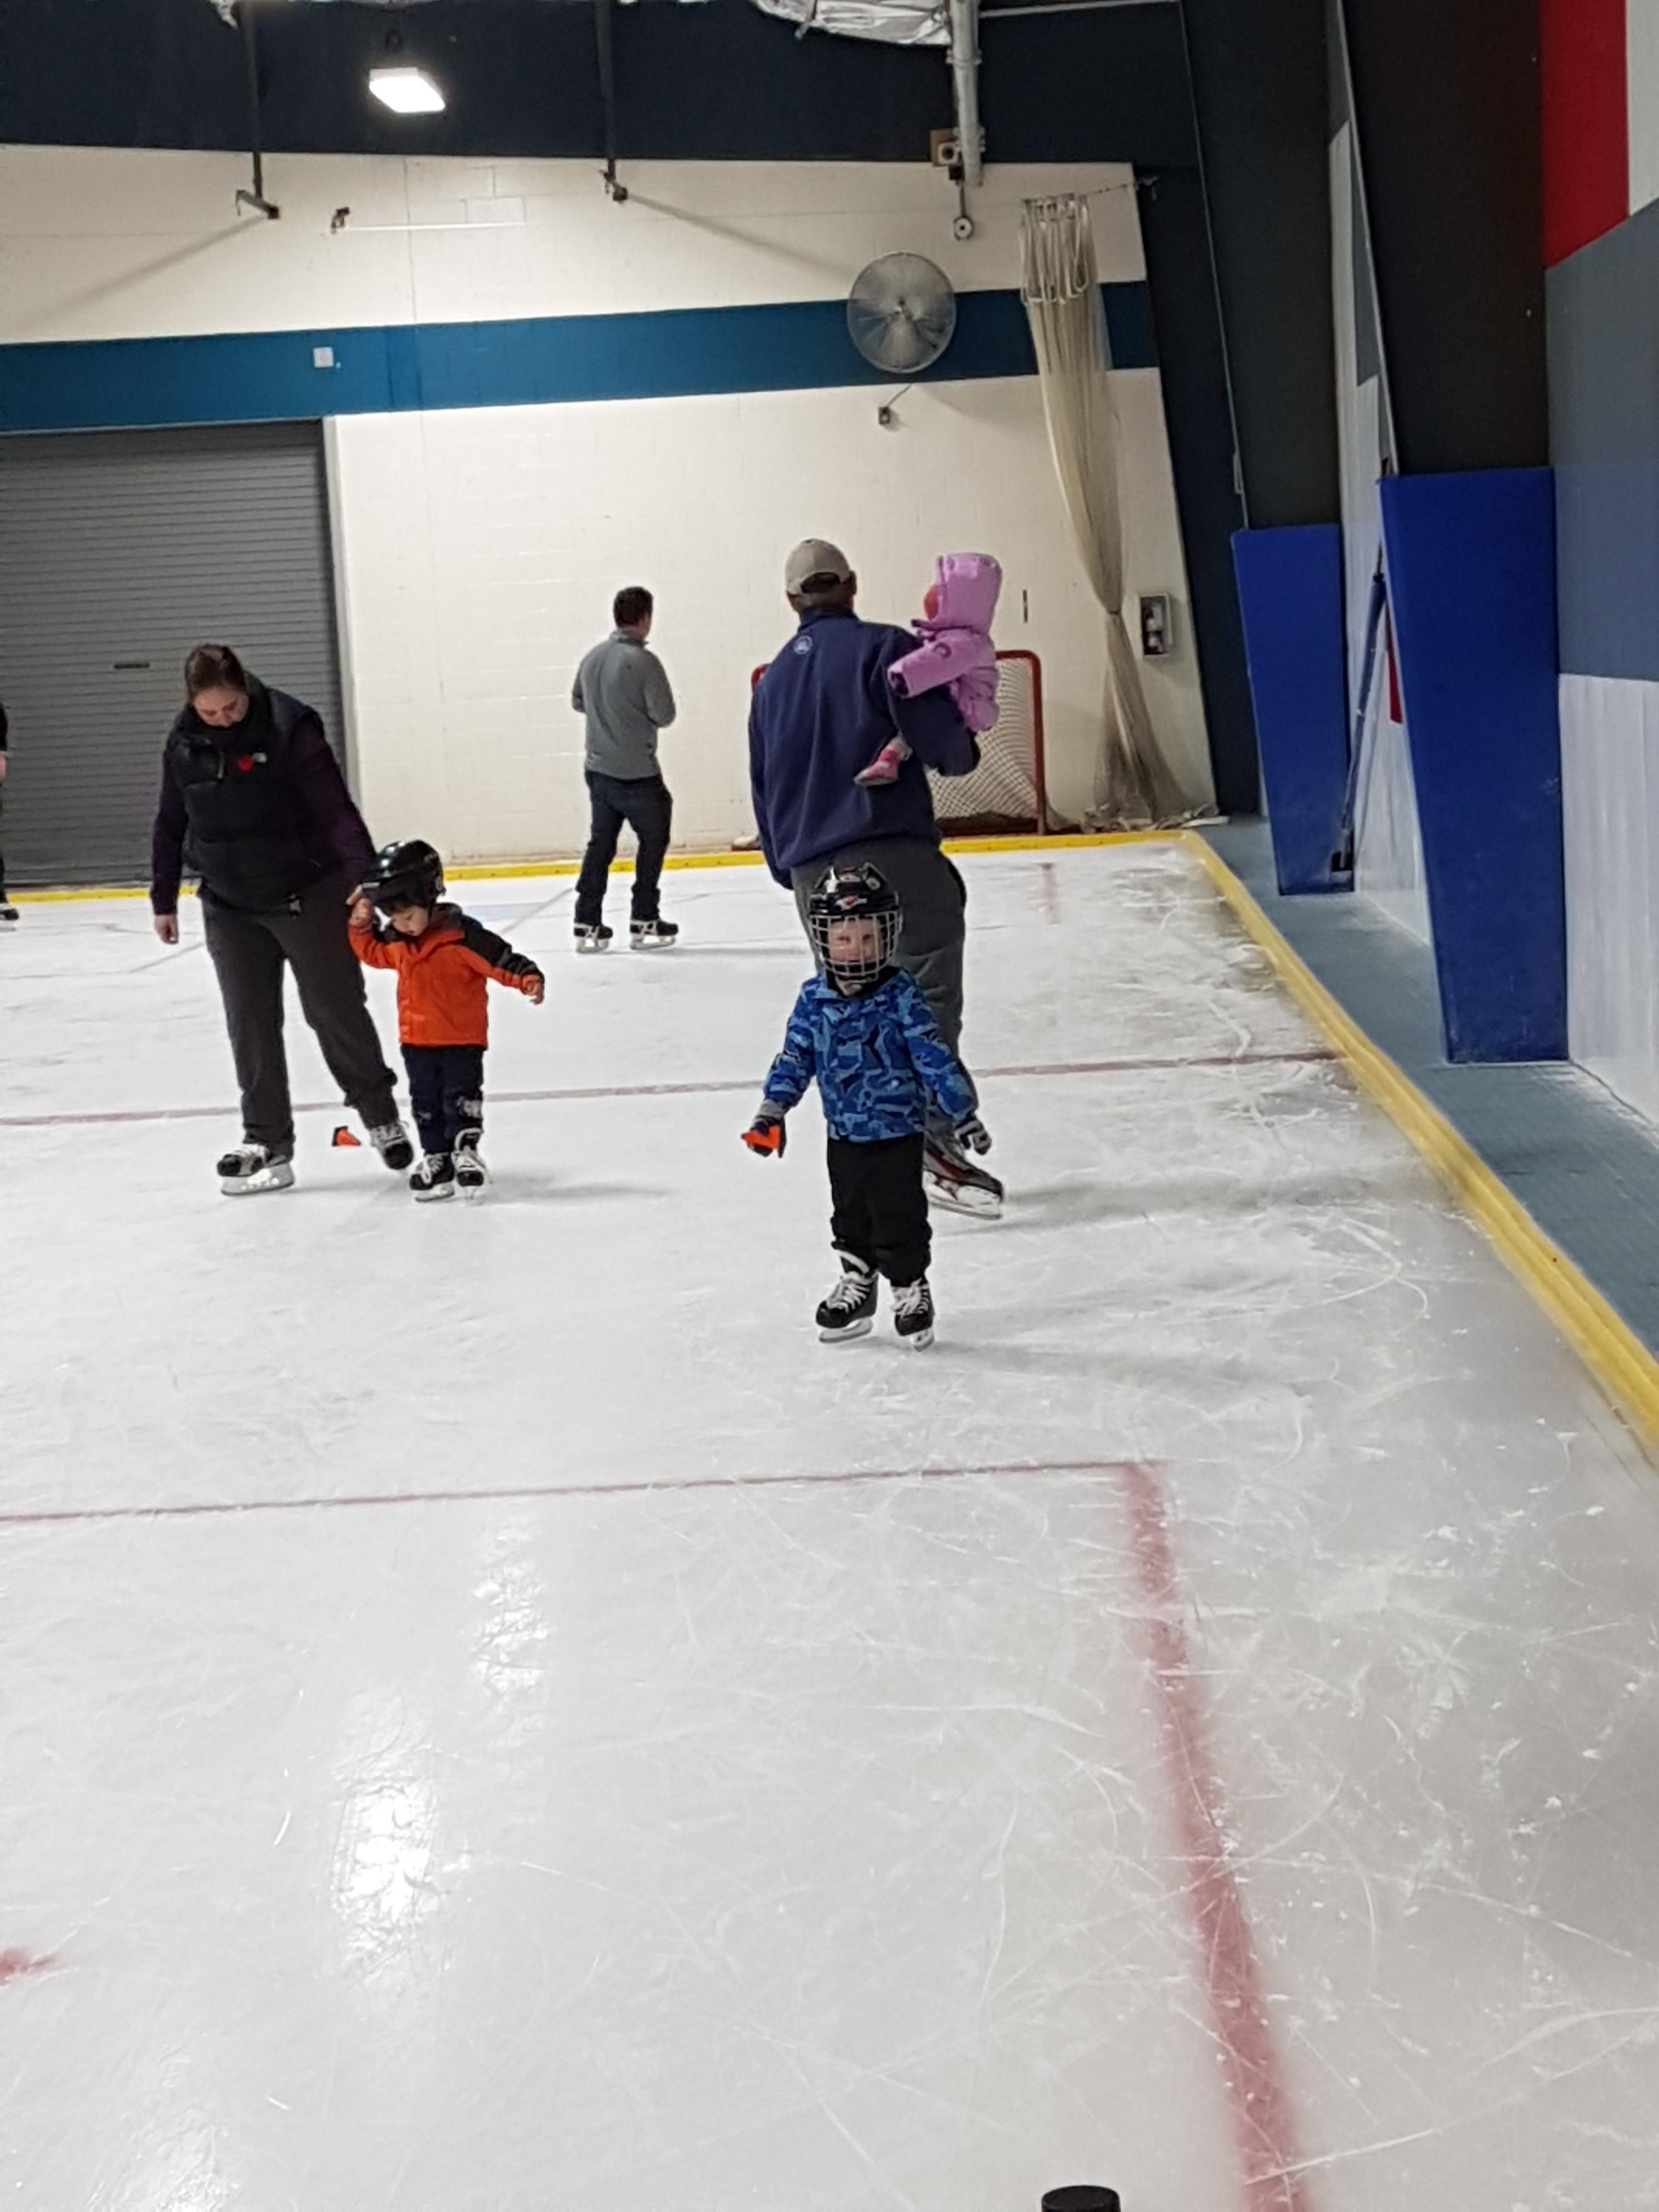 Kids Fun Skating - Ages 3-5